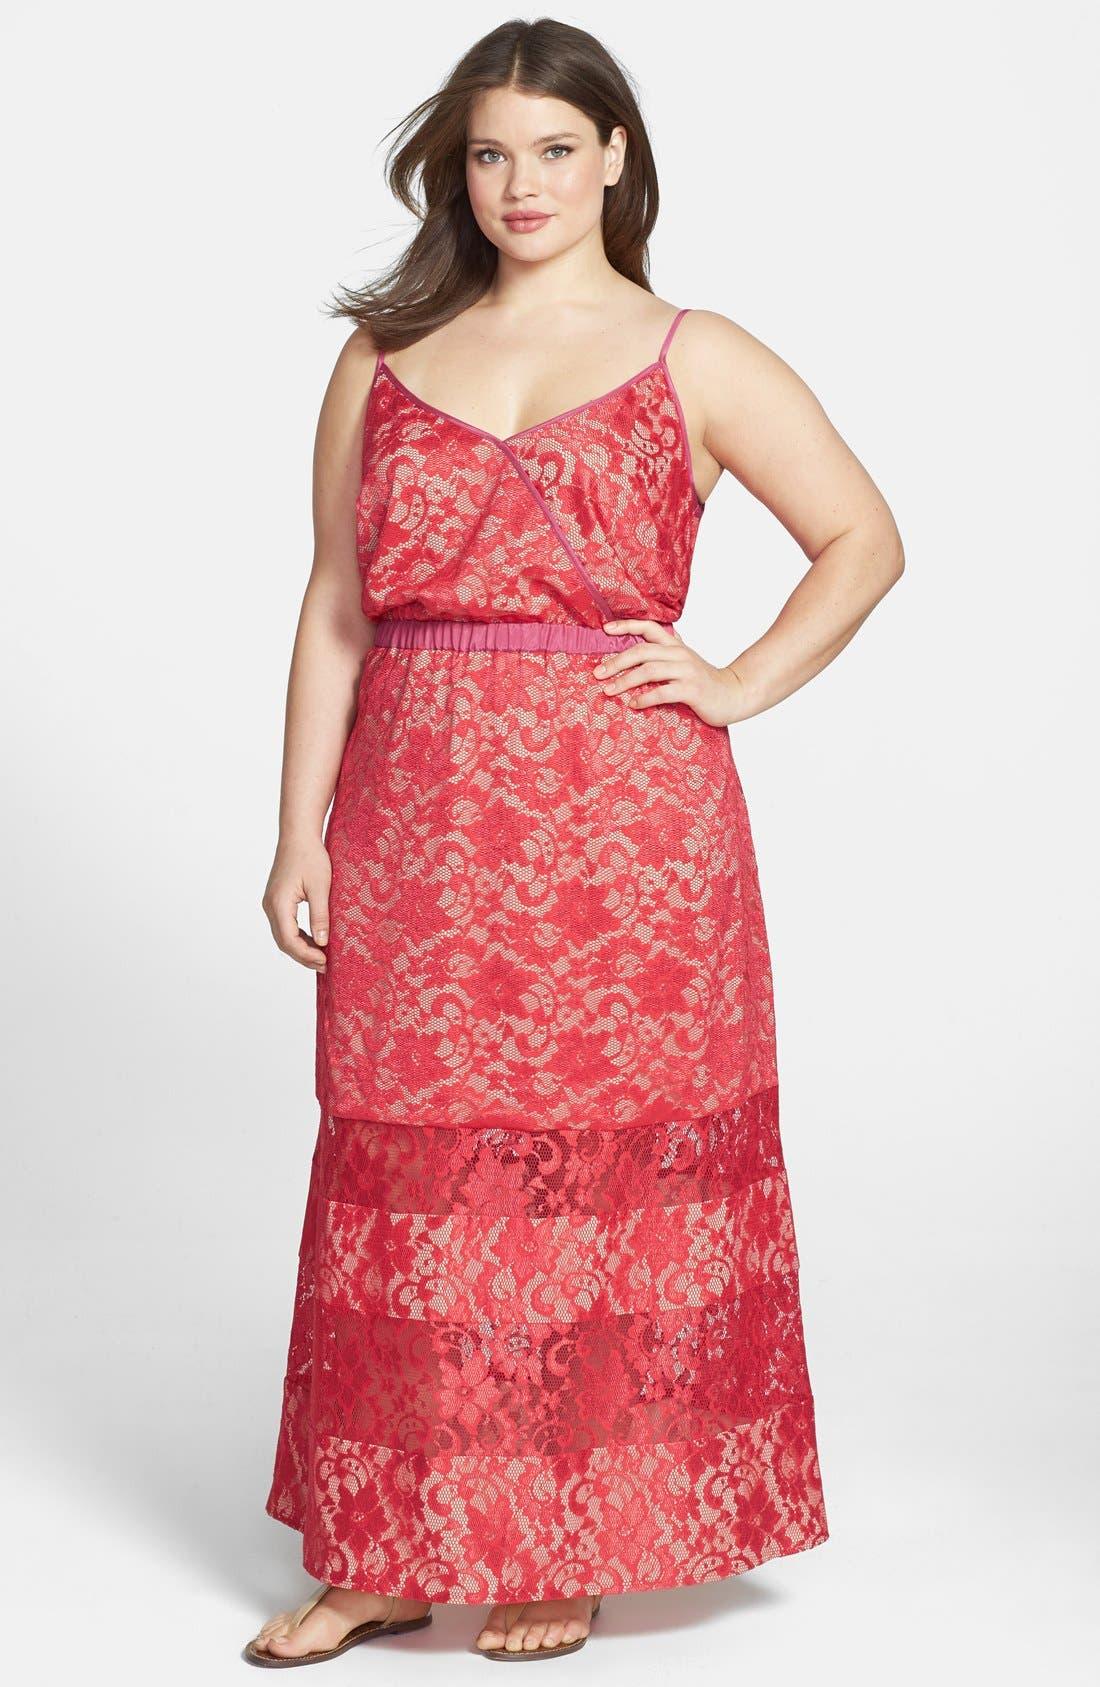 Alternate Image 1 Selected - ABS by Allen Schwartz Lace Maxi Dress (Plus Size)